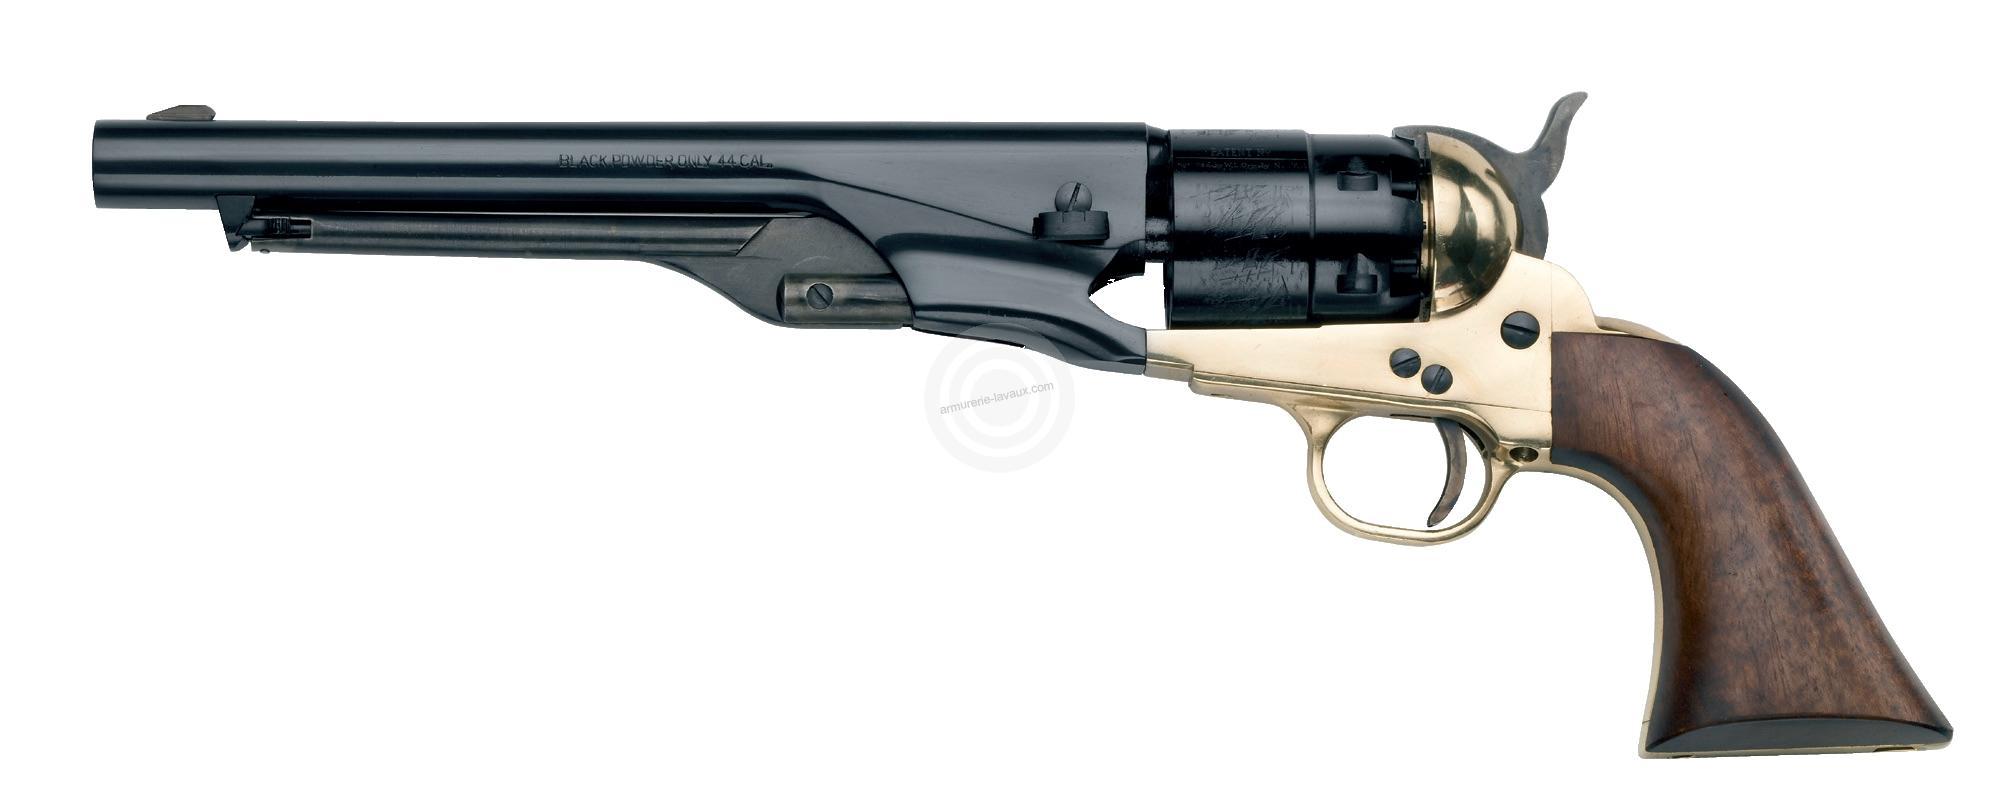 Revolver à Poudre Noire Pietta COLT Army Laiton 1860 cal.44